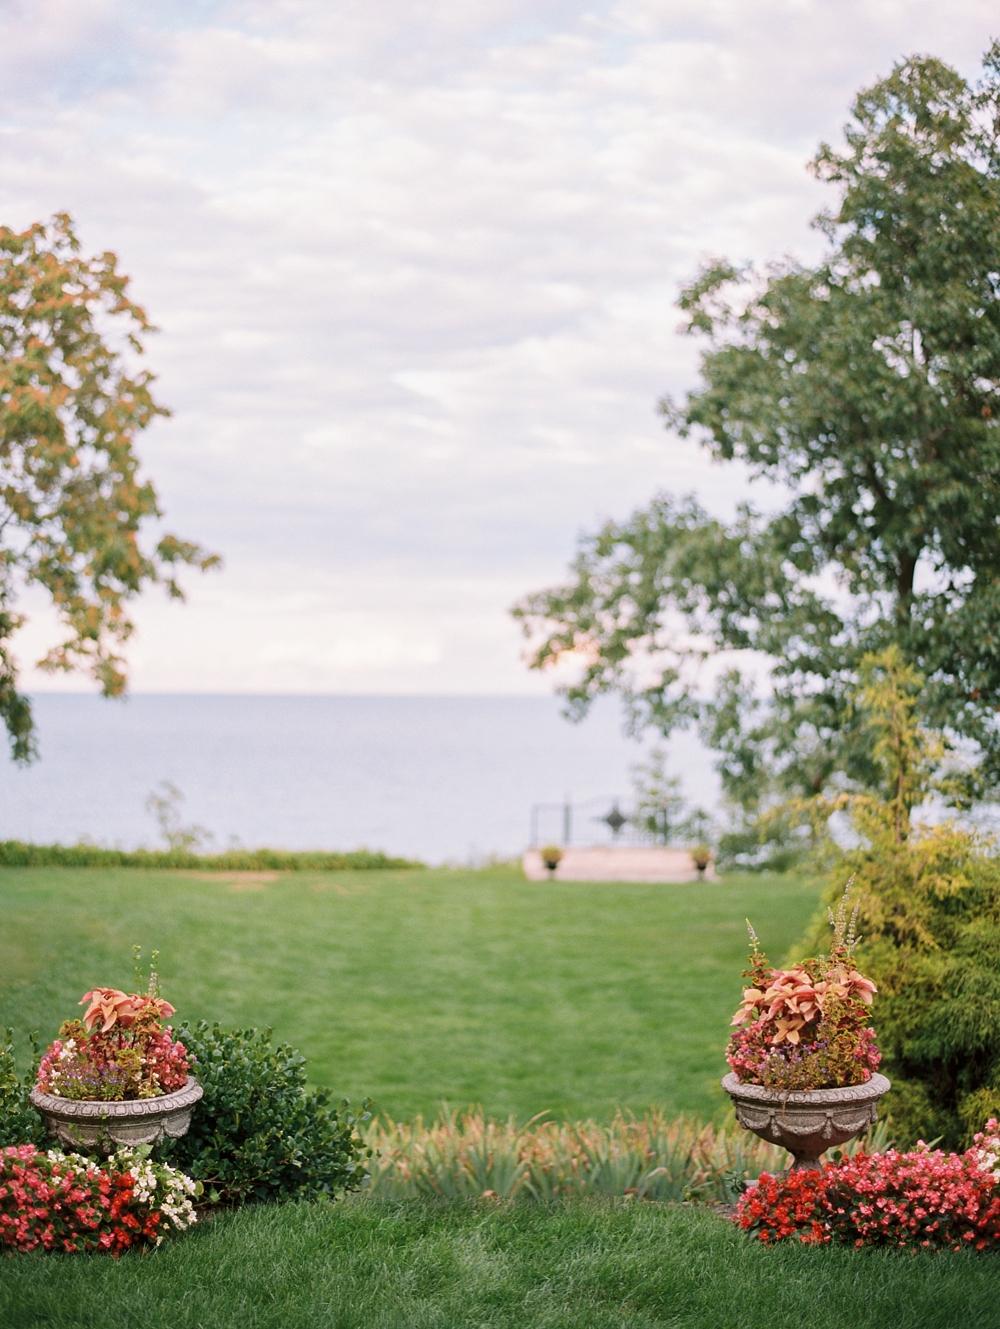 kristin-la-voie-photography-Chicago-Engagement-glencoe-beach-lake-michigan-100